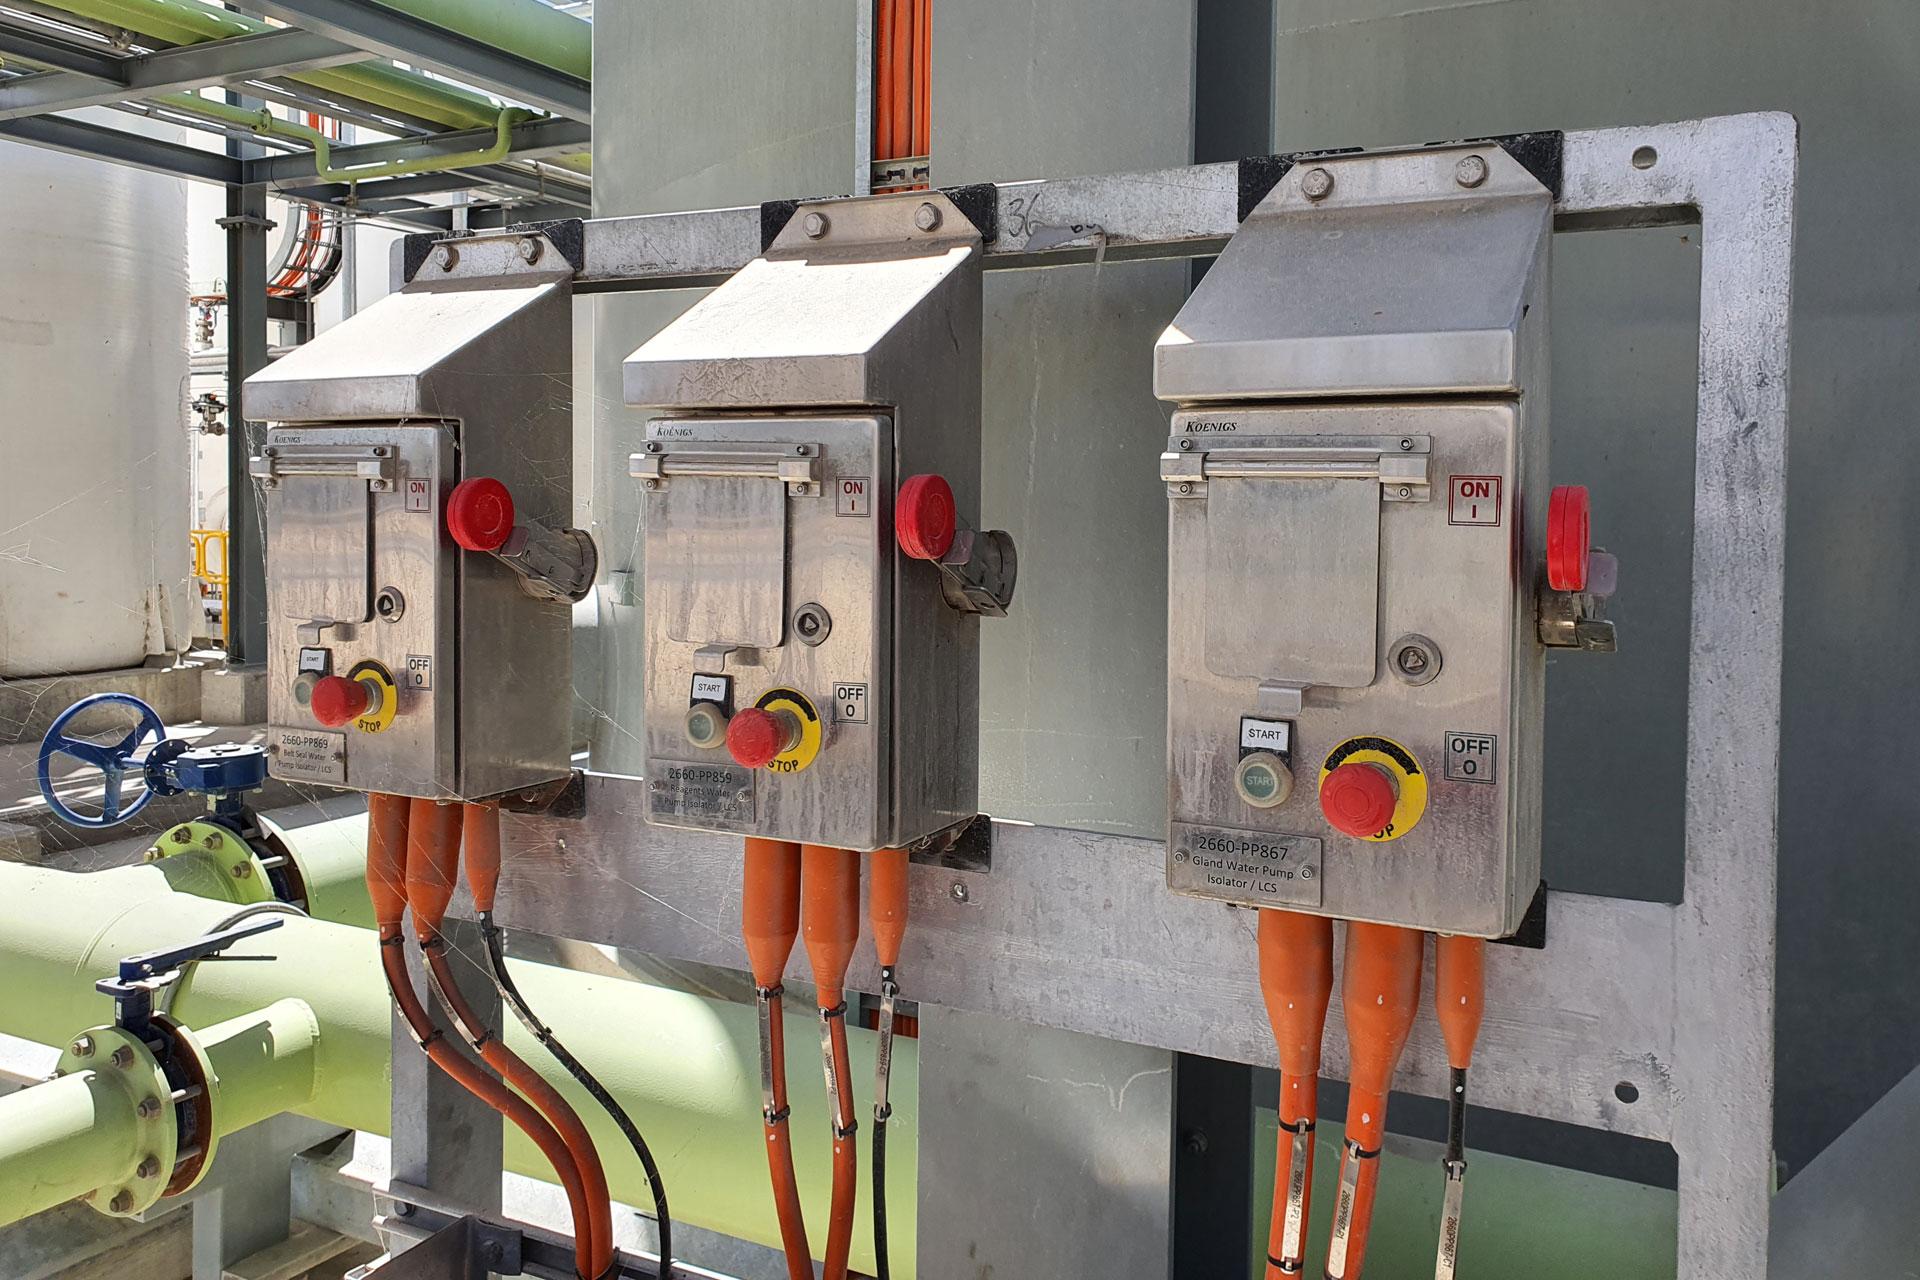 https://koenigs.com.au/wp-content/uploads/2015/09/talison-lithium-wa-sloped-roof-koenigs-isolators.jpg